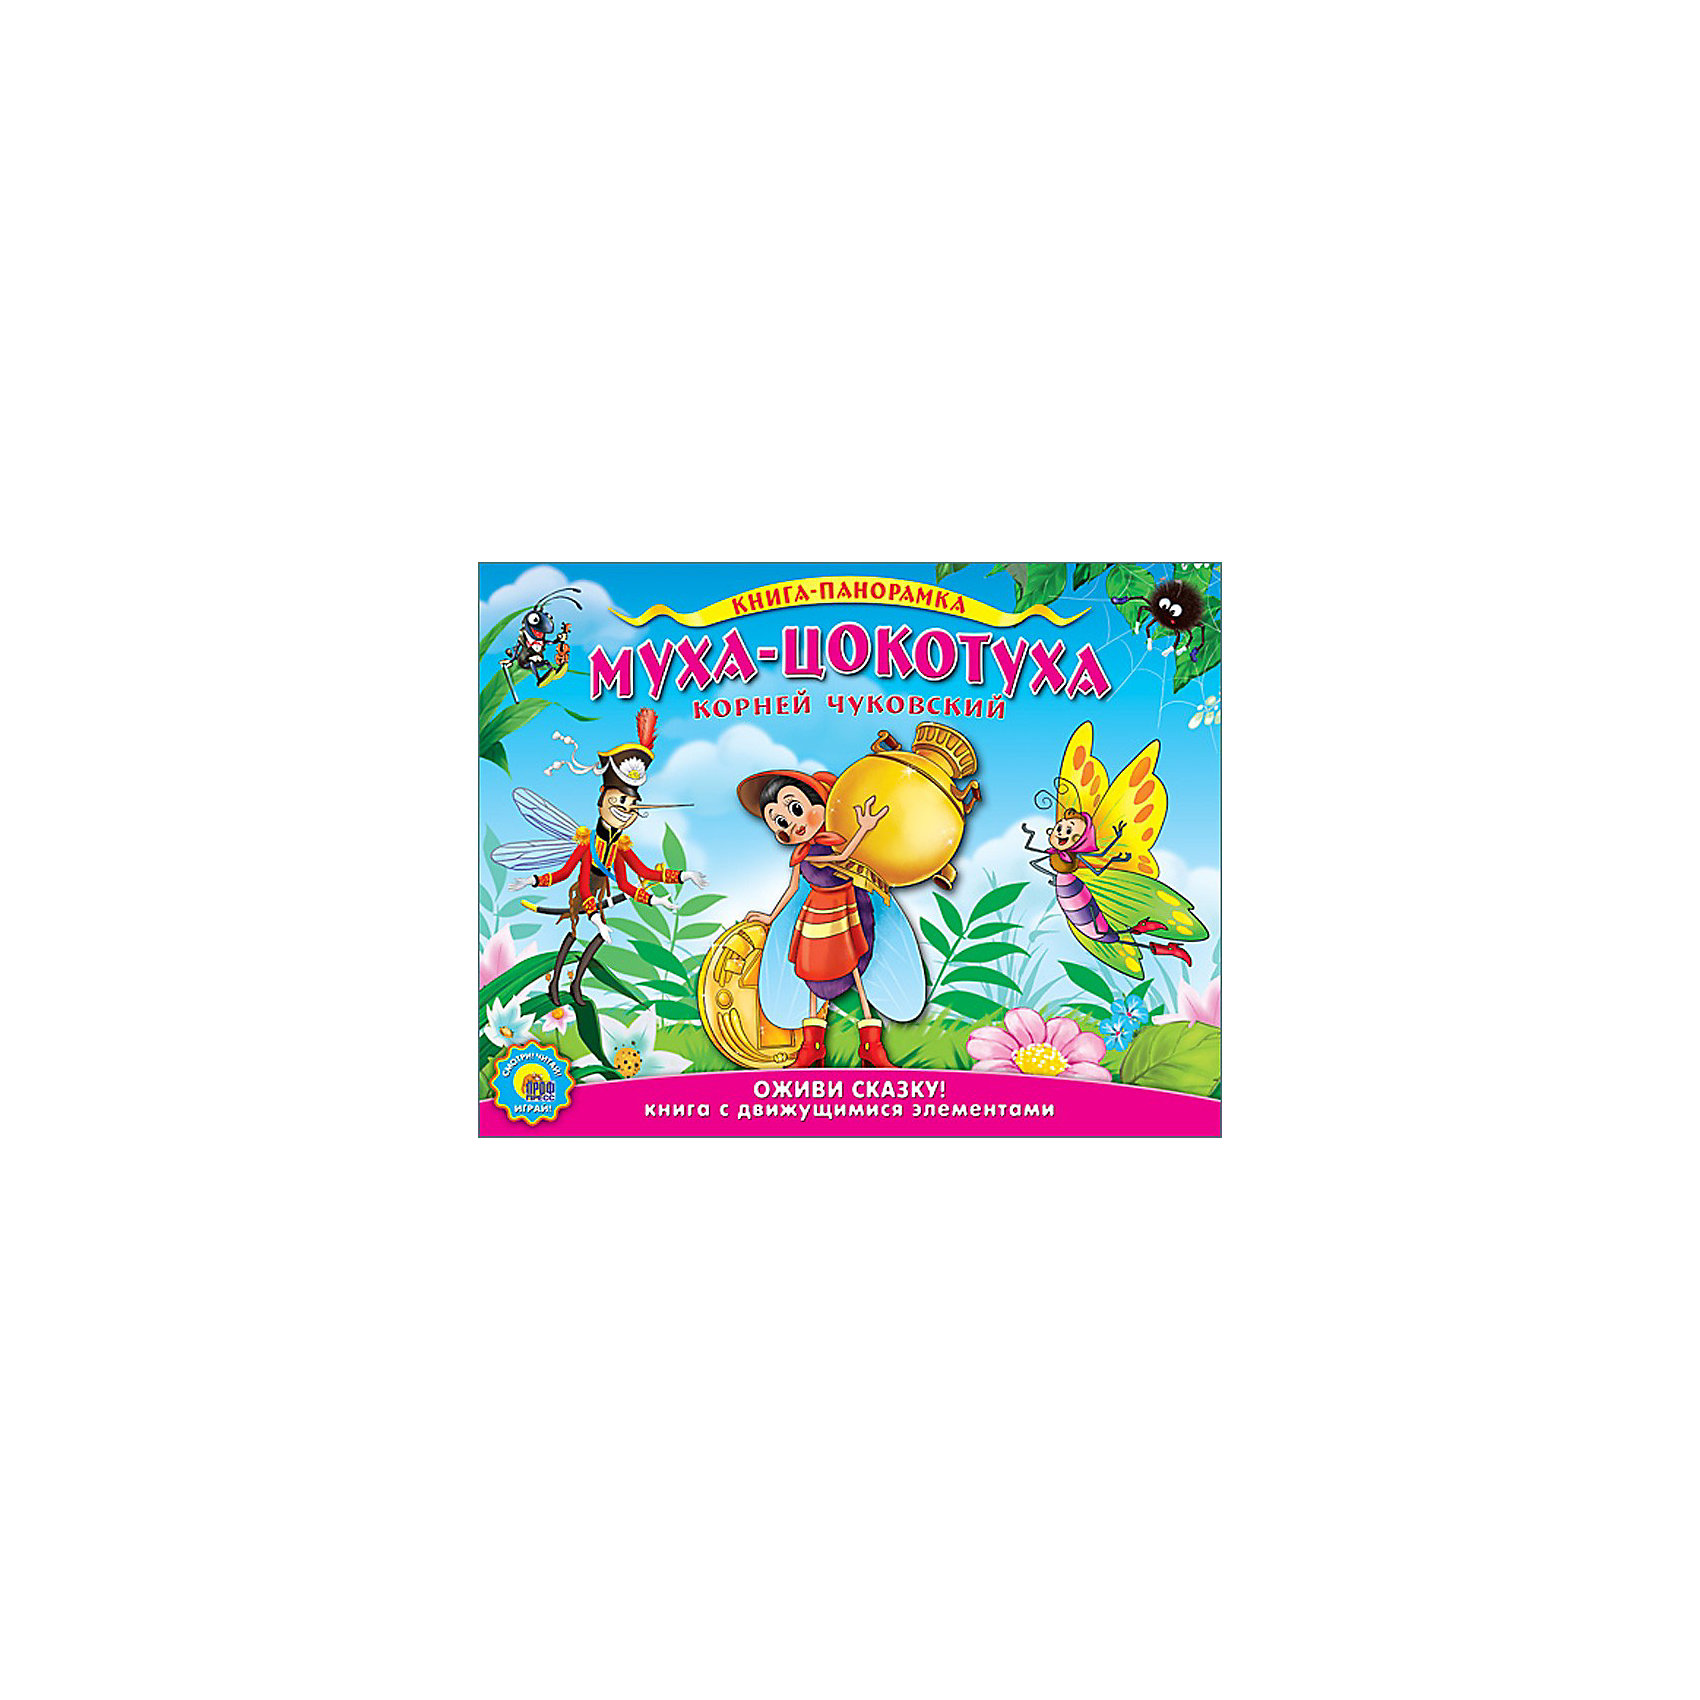 Проф-Пресс Книга-панорама Муха-Цокотуха, К. Чуковский азбукварик муха цокотуха говорящие сказки